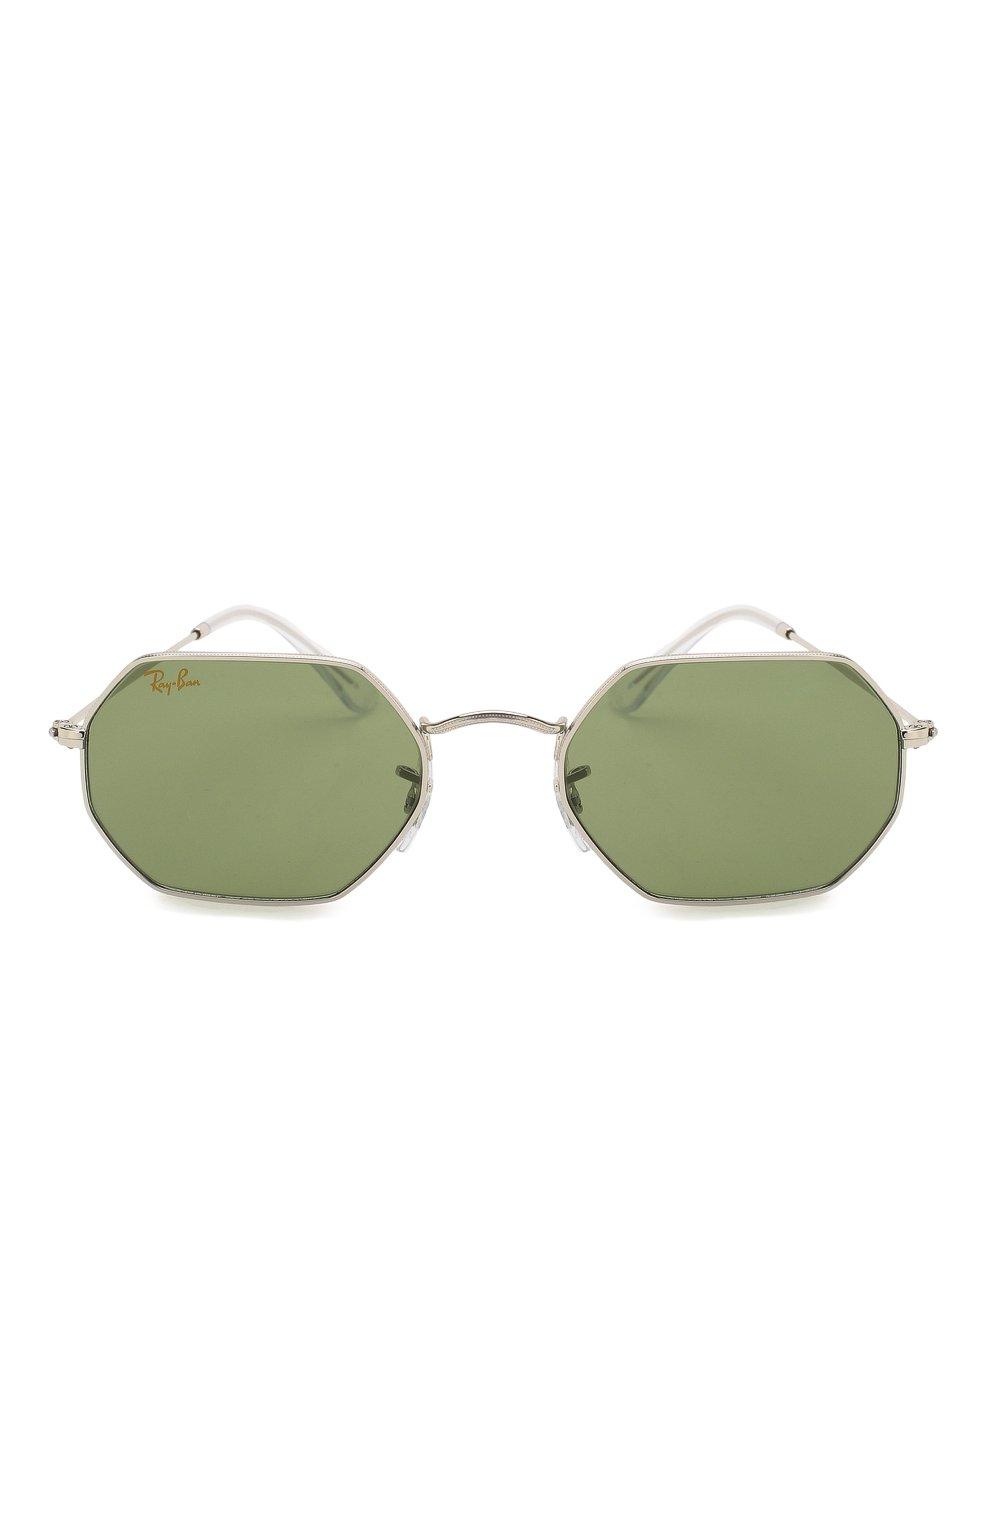 Женские солнцезащитные очки RAY-BAN зеленого цвета, арт. 3556-91984E   Фото 4